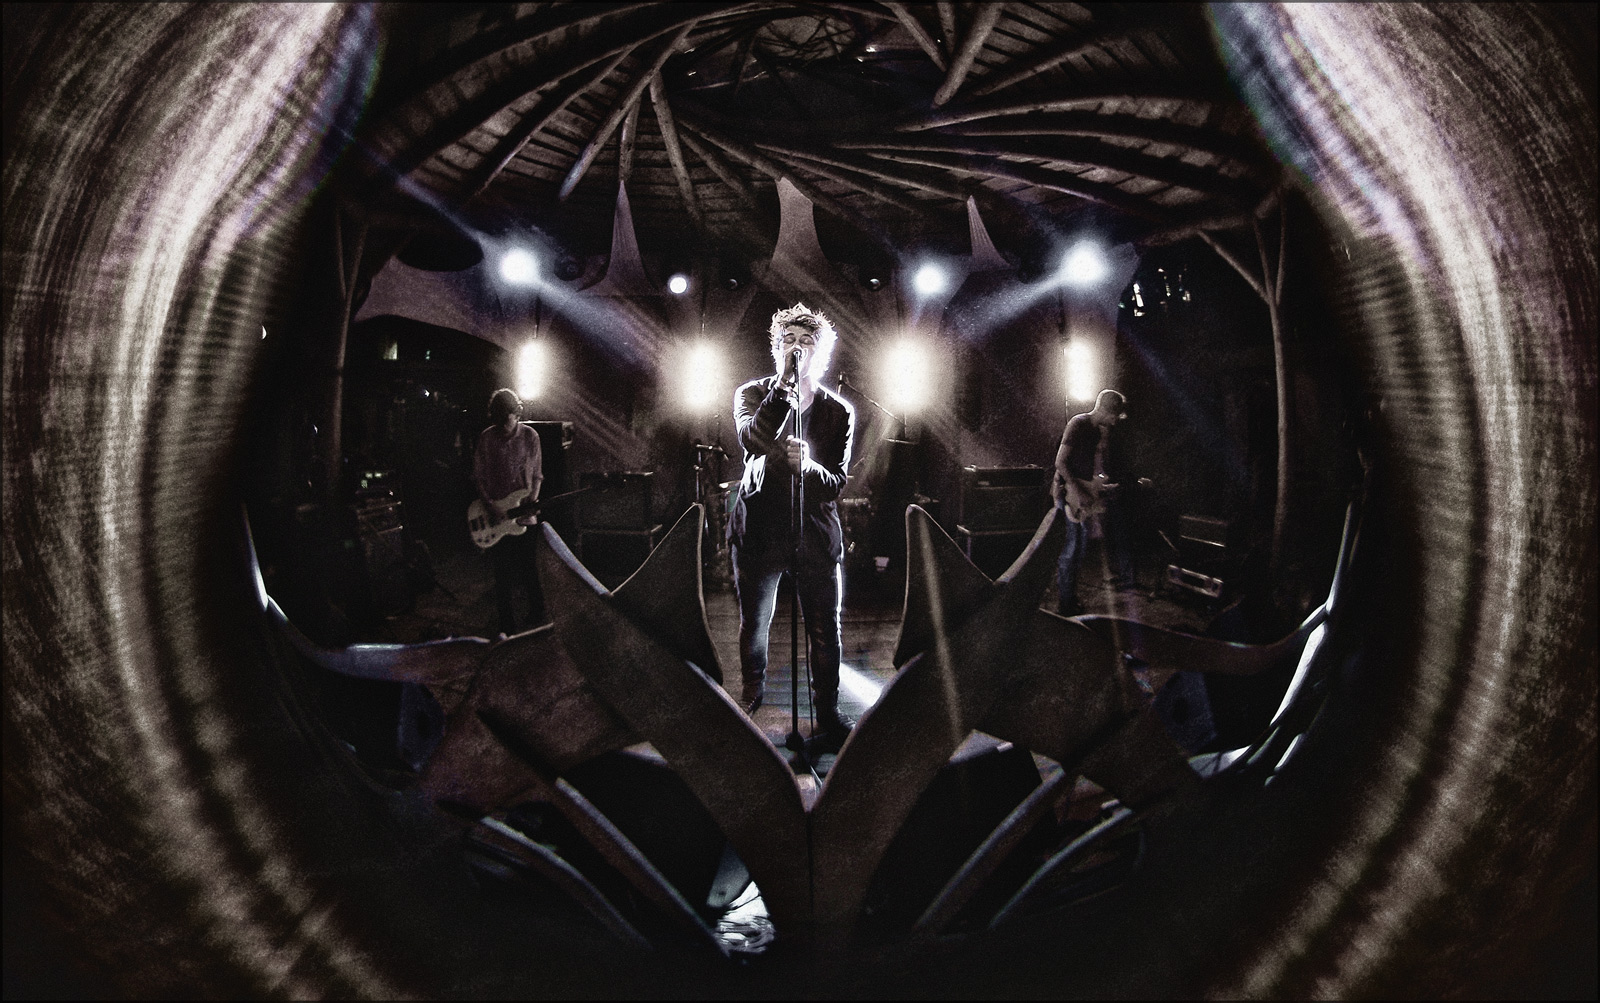 Girl Band - Electric Picnic - 2014